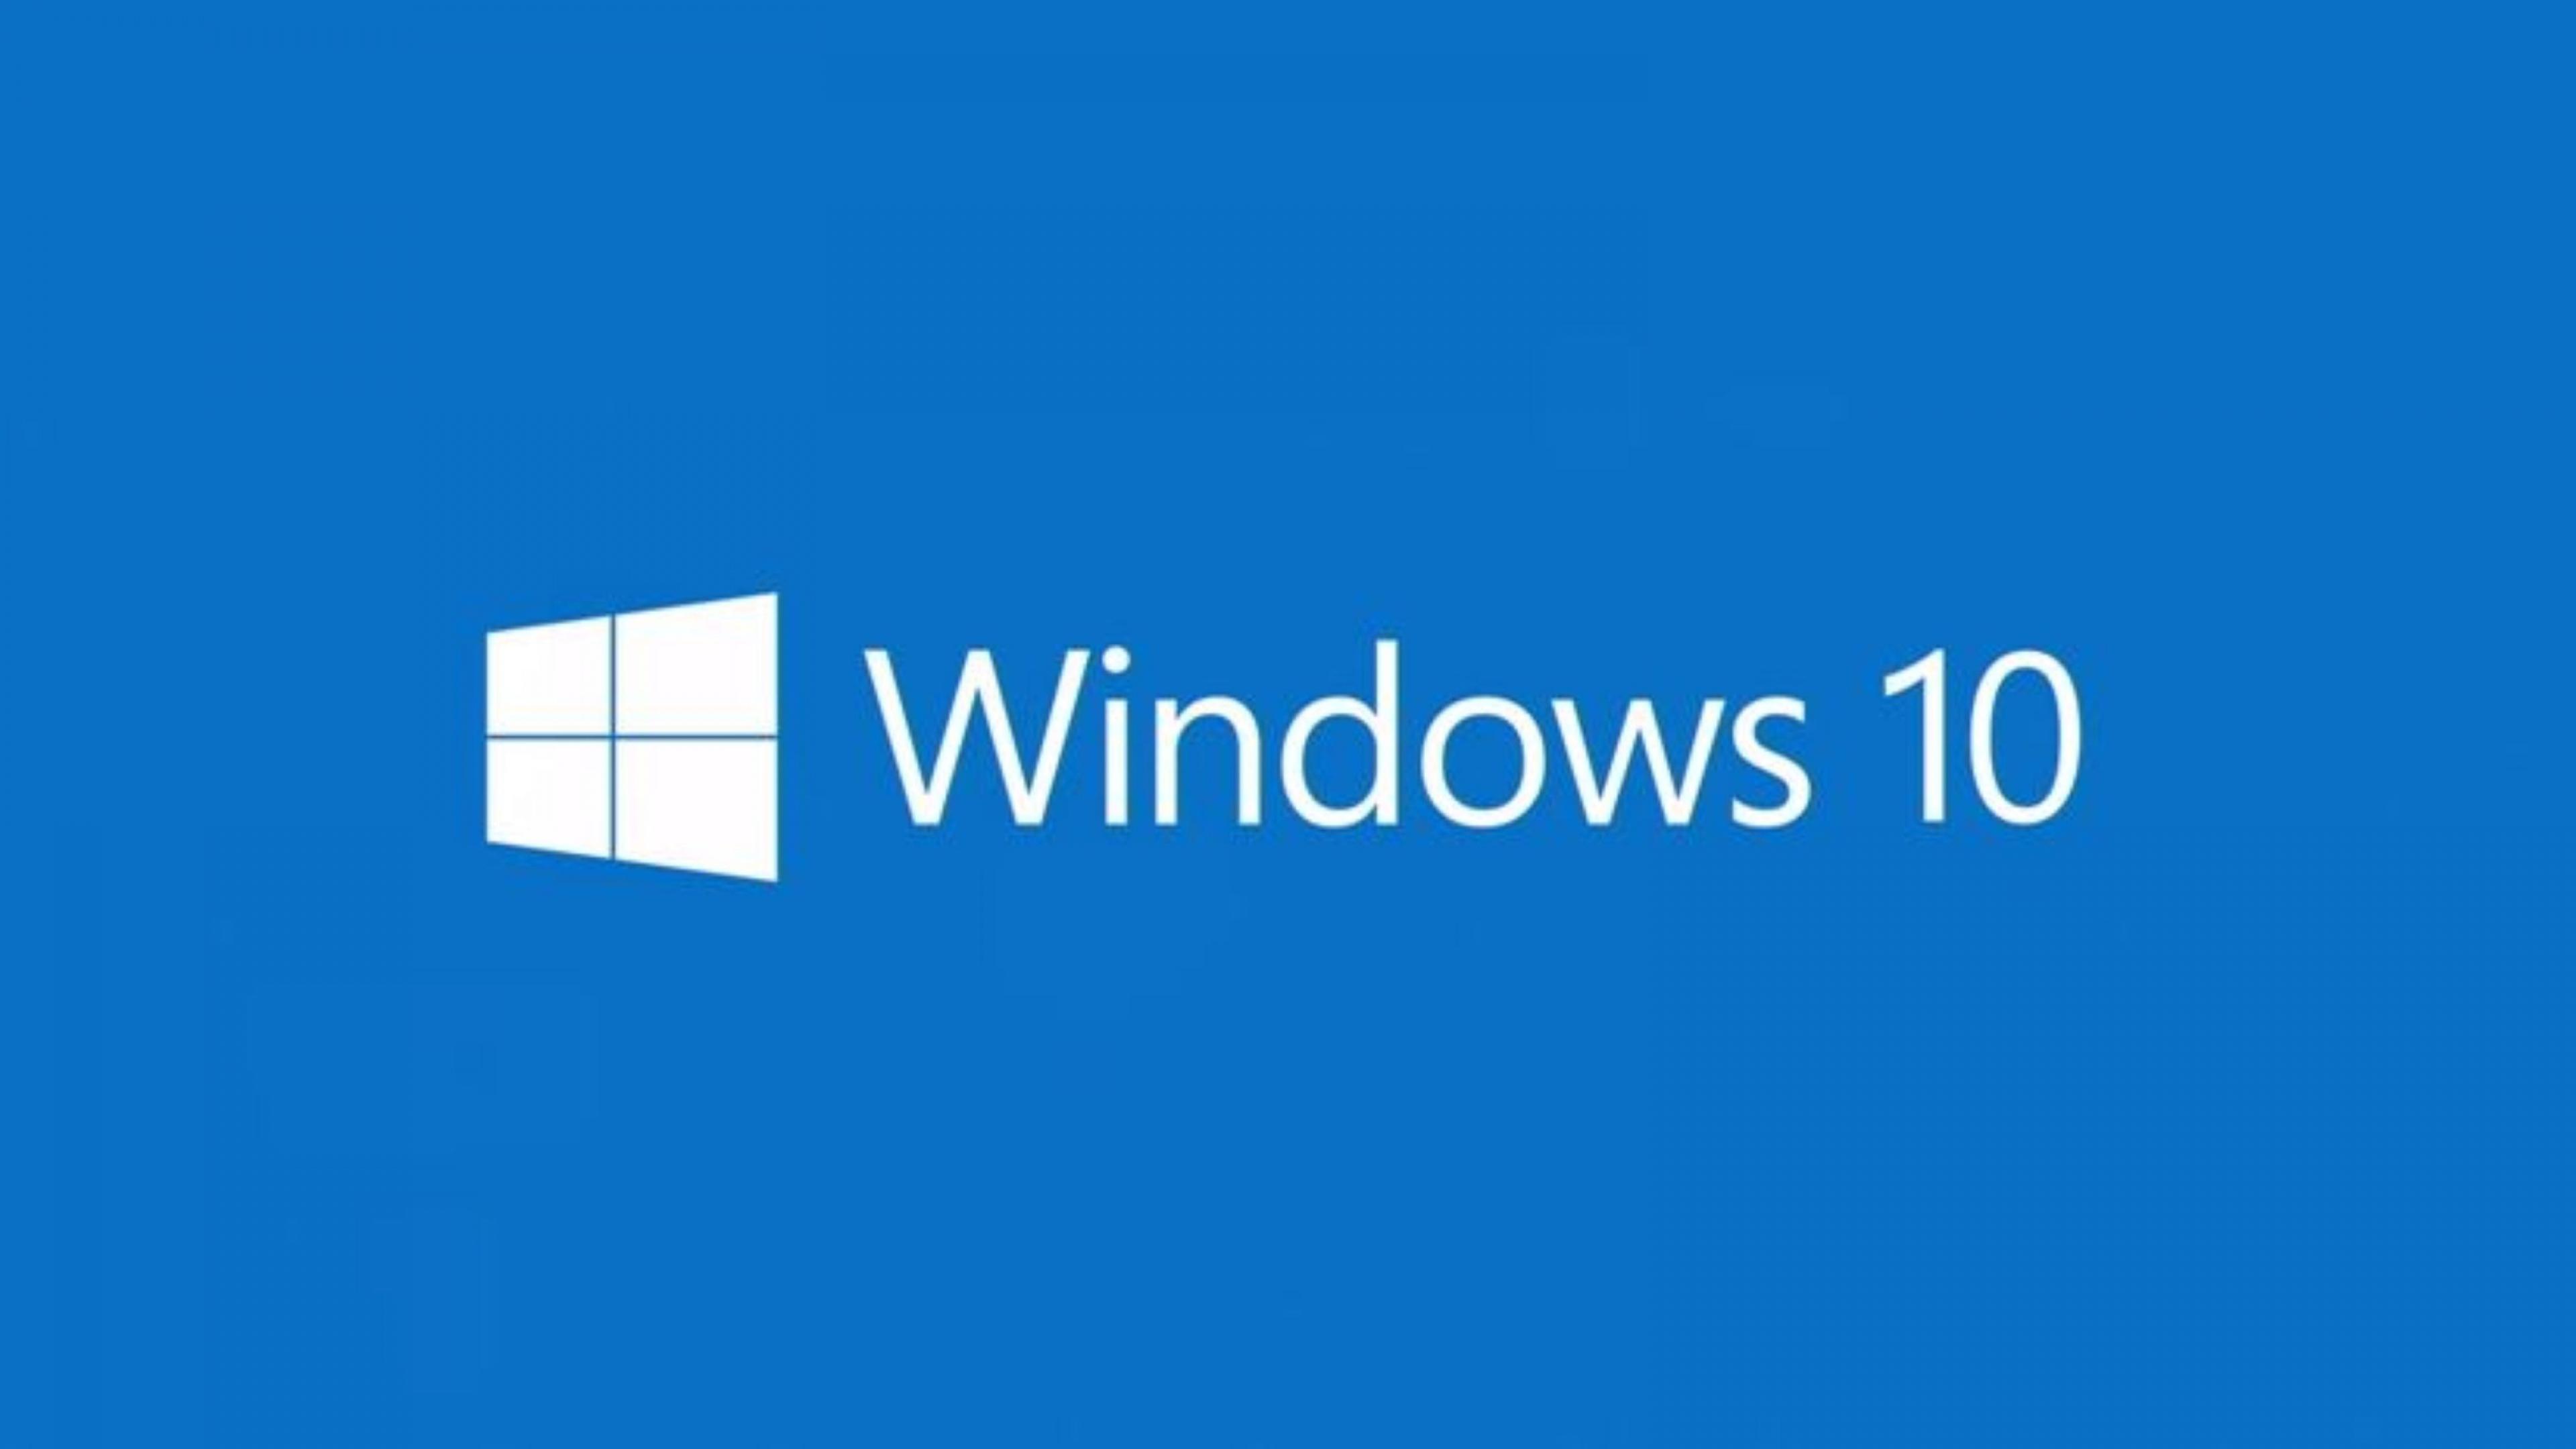 Windows 10 White and Blue 4K Wallpaper 4K Wallpaper   Ultra HD 4K 3840x2160